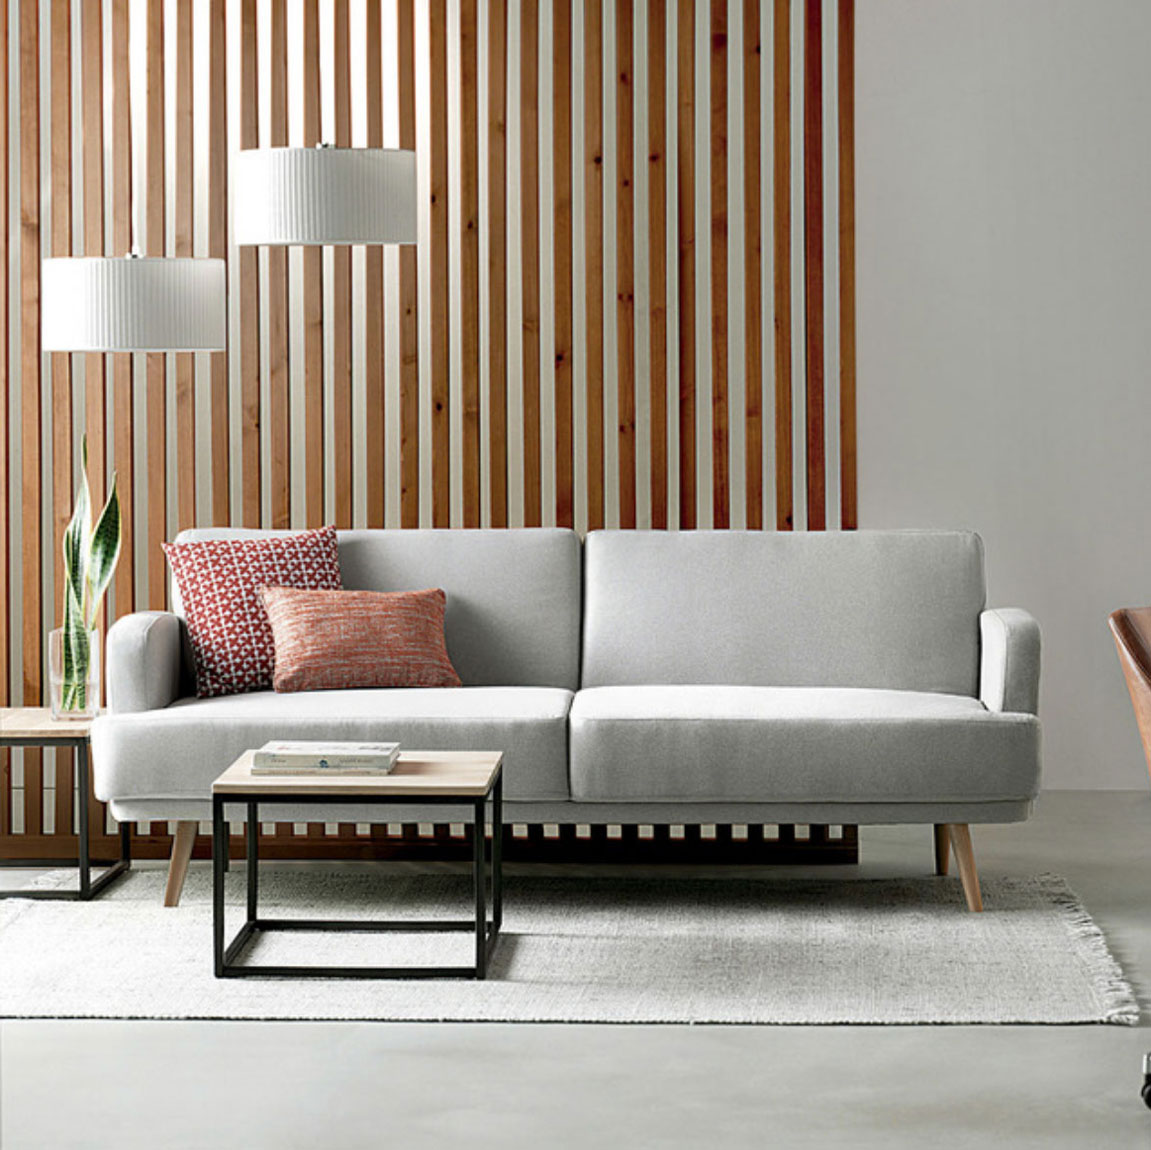 Los mejores sof cama - Bisagras para sofa cama ...